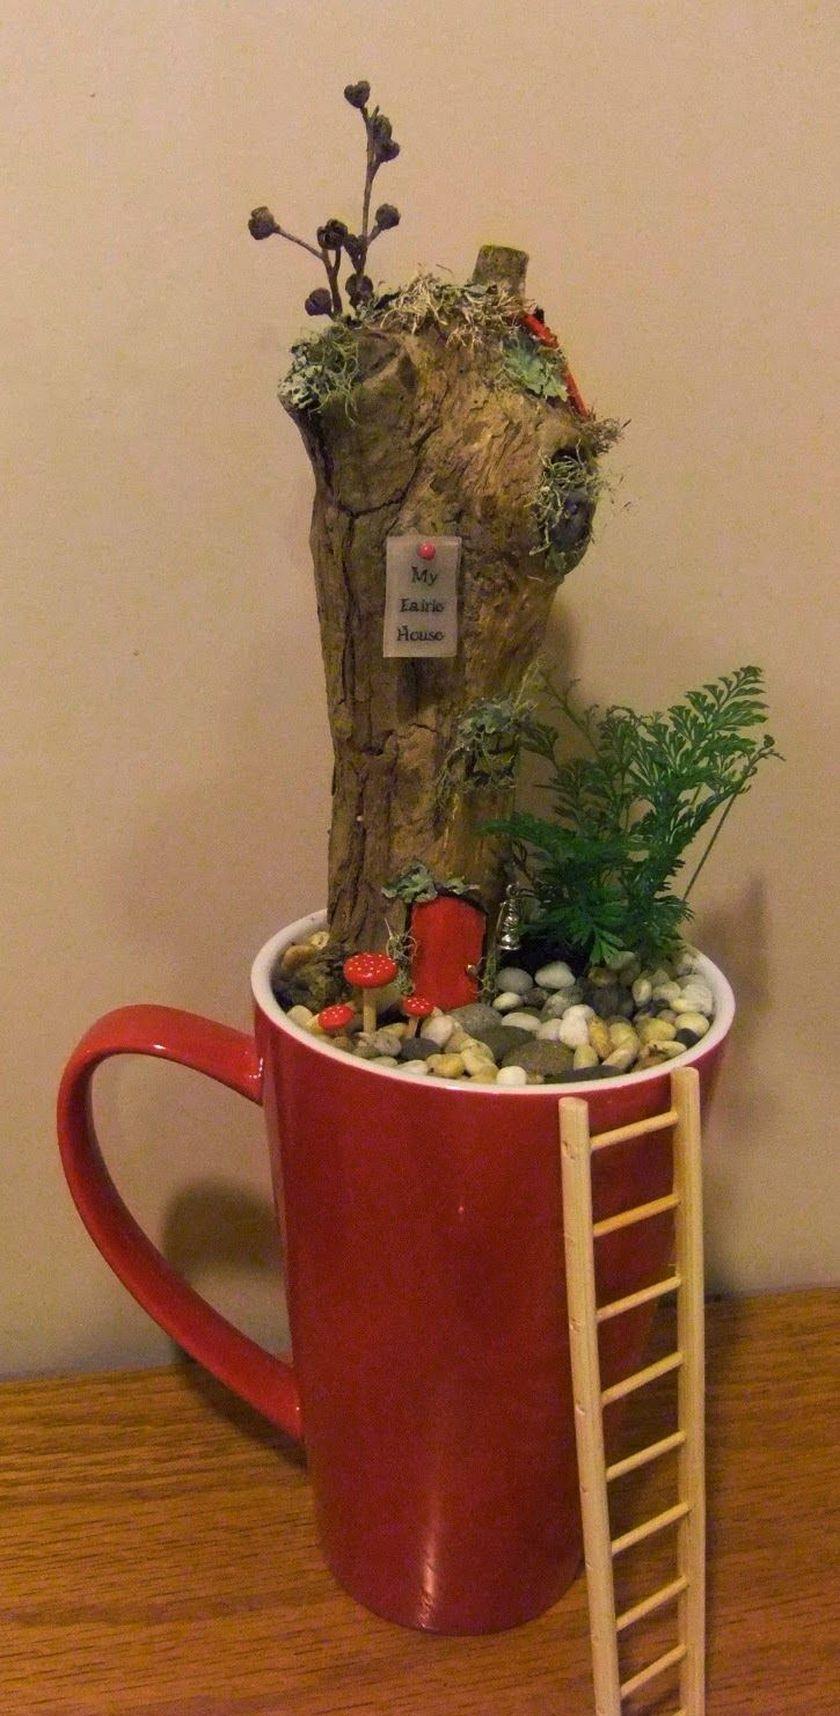 Impressive mini garden mug ideas to add beauty on your home 34